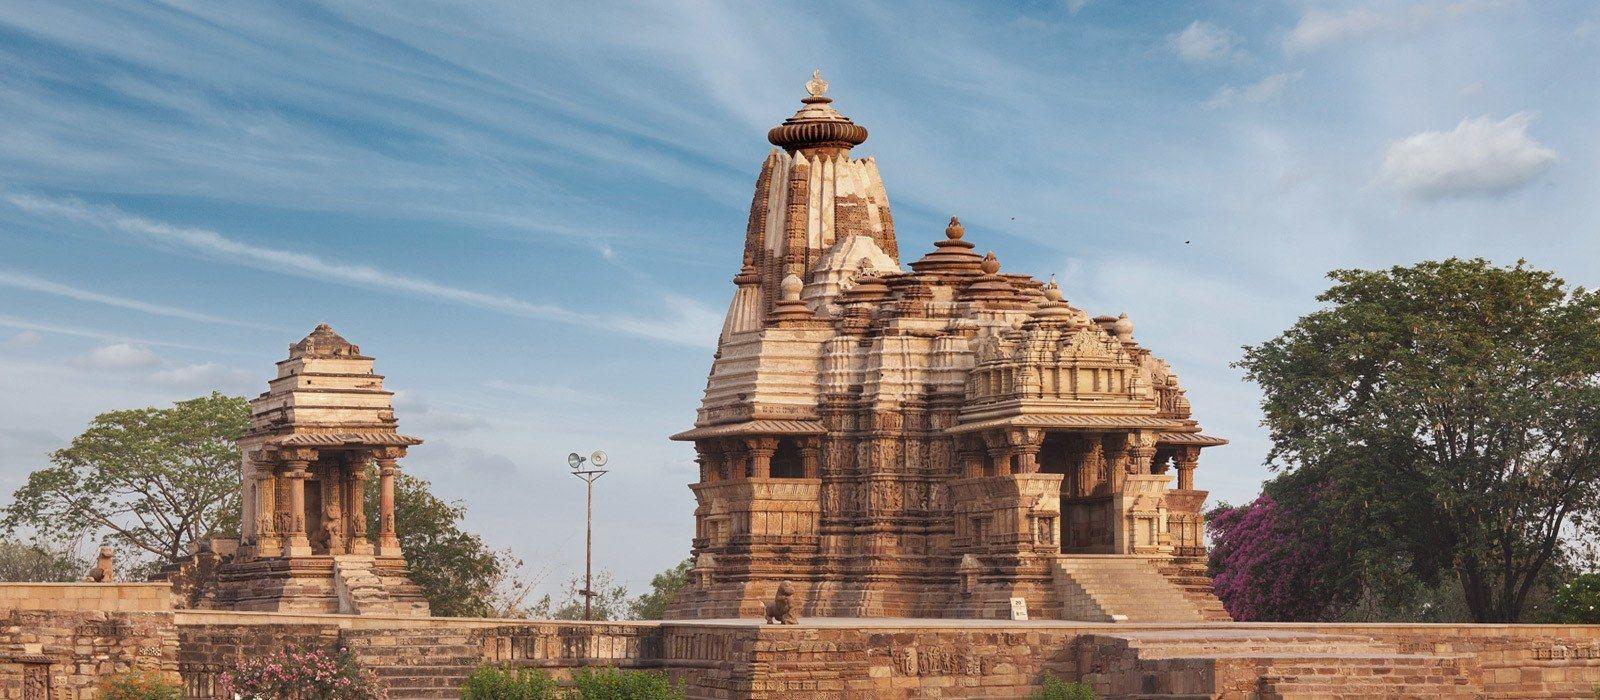 Nordindien Rundreise: Städte, Tempel & Safaris Urlaub 4